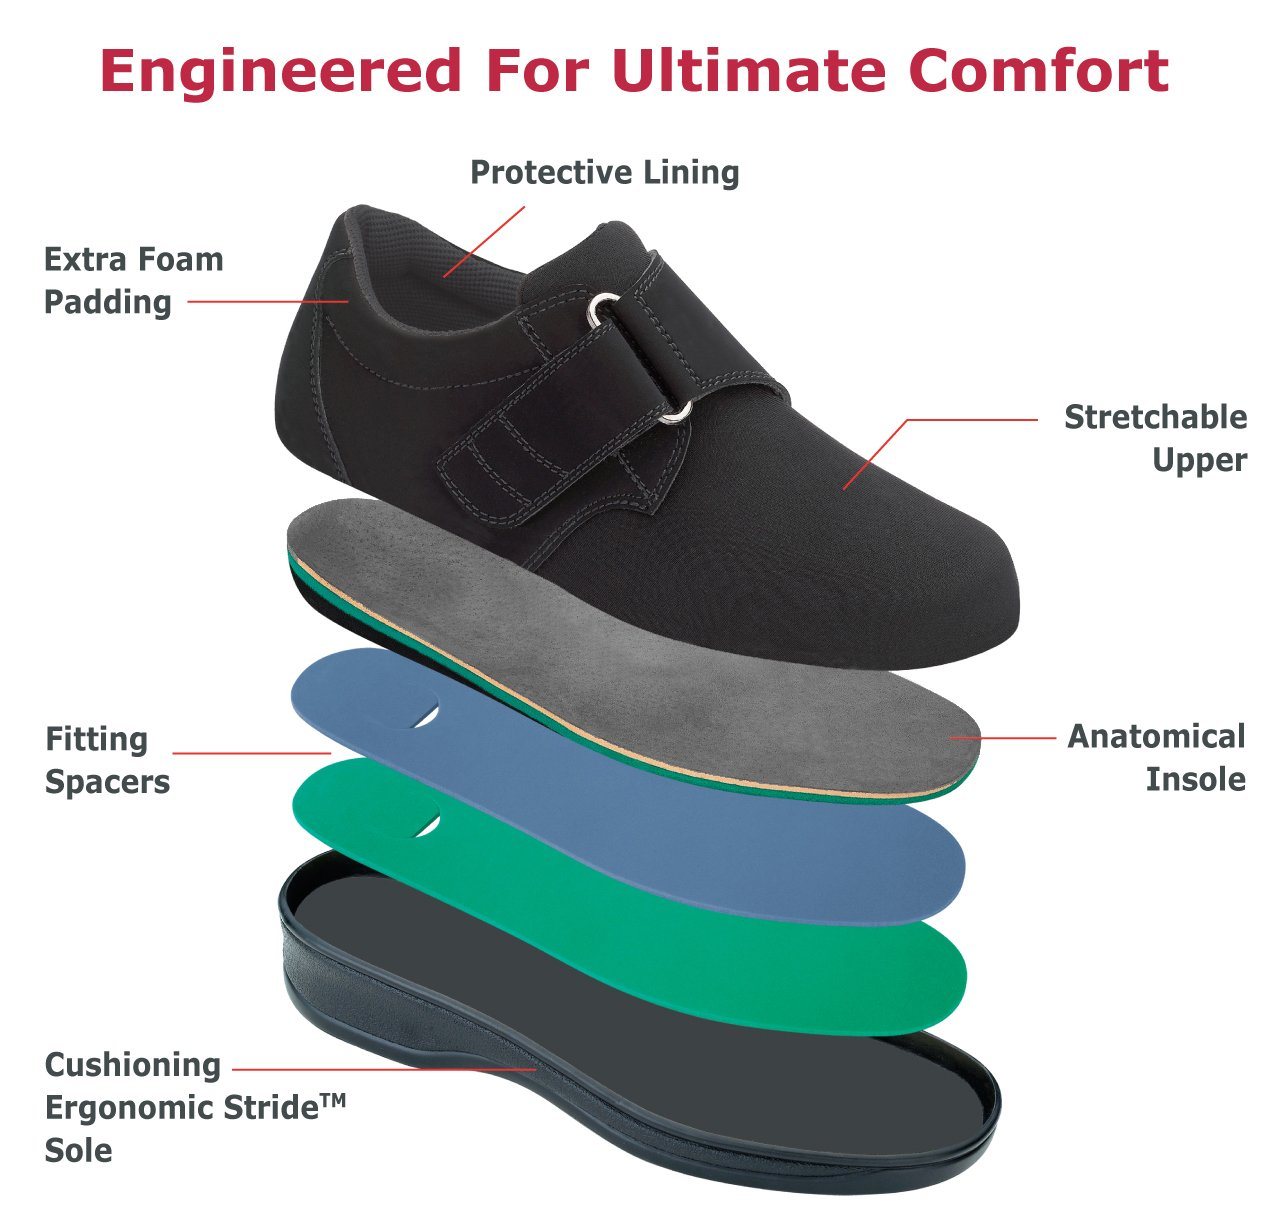 Orthofeet Wichita Women's Comfort Stretchable Orthopedic Orthotic Diabetic Velcro Shoes Black Synthetic 8.5 M US by Orthofeet (Image #2)